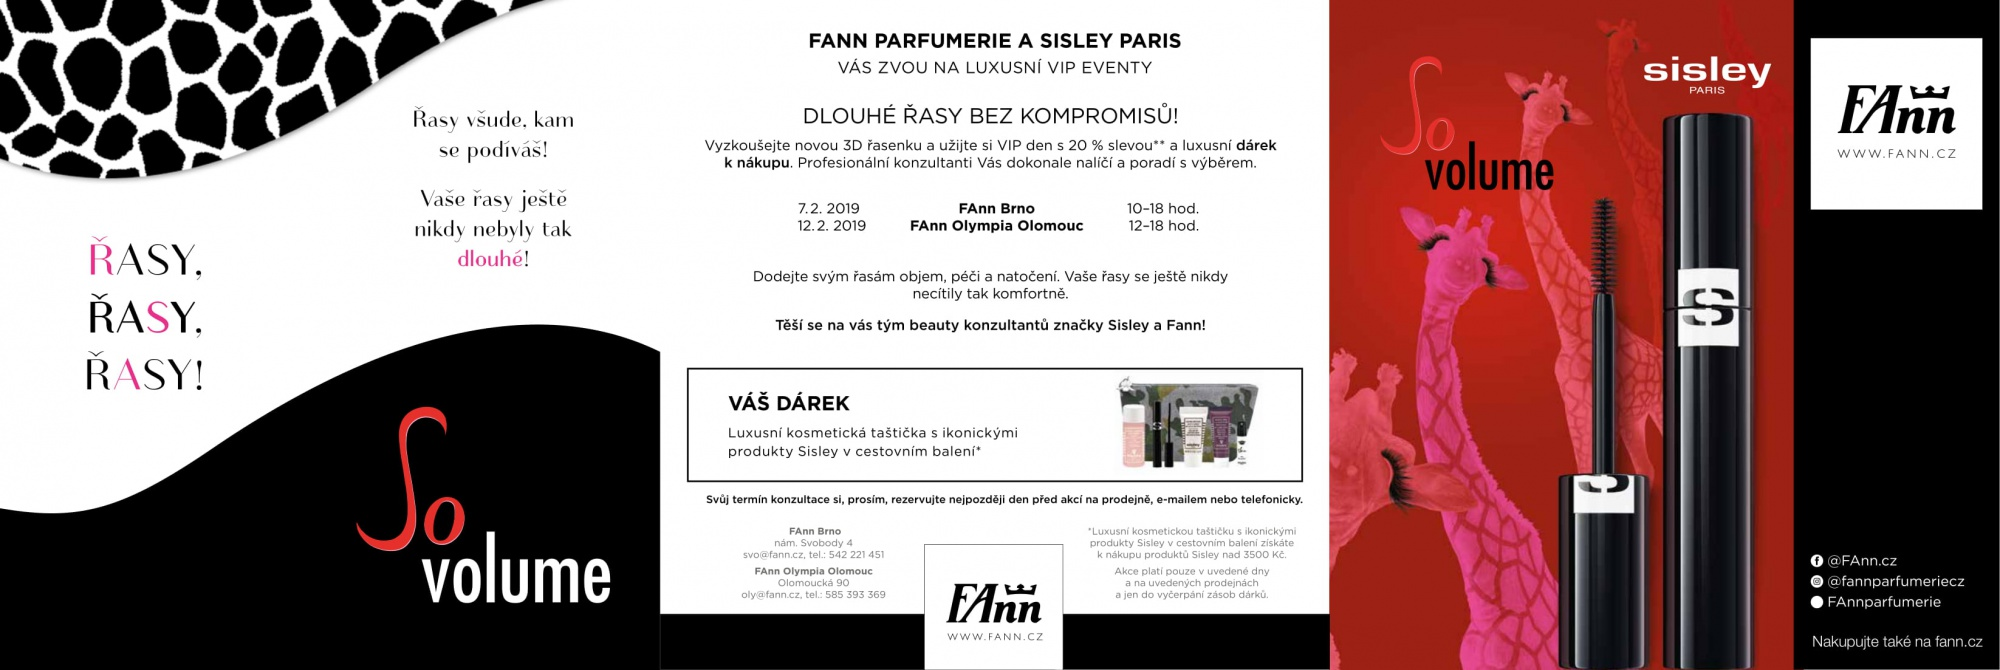 307d0749c2 FAnn  VIP Event - FAnn